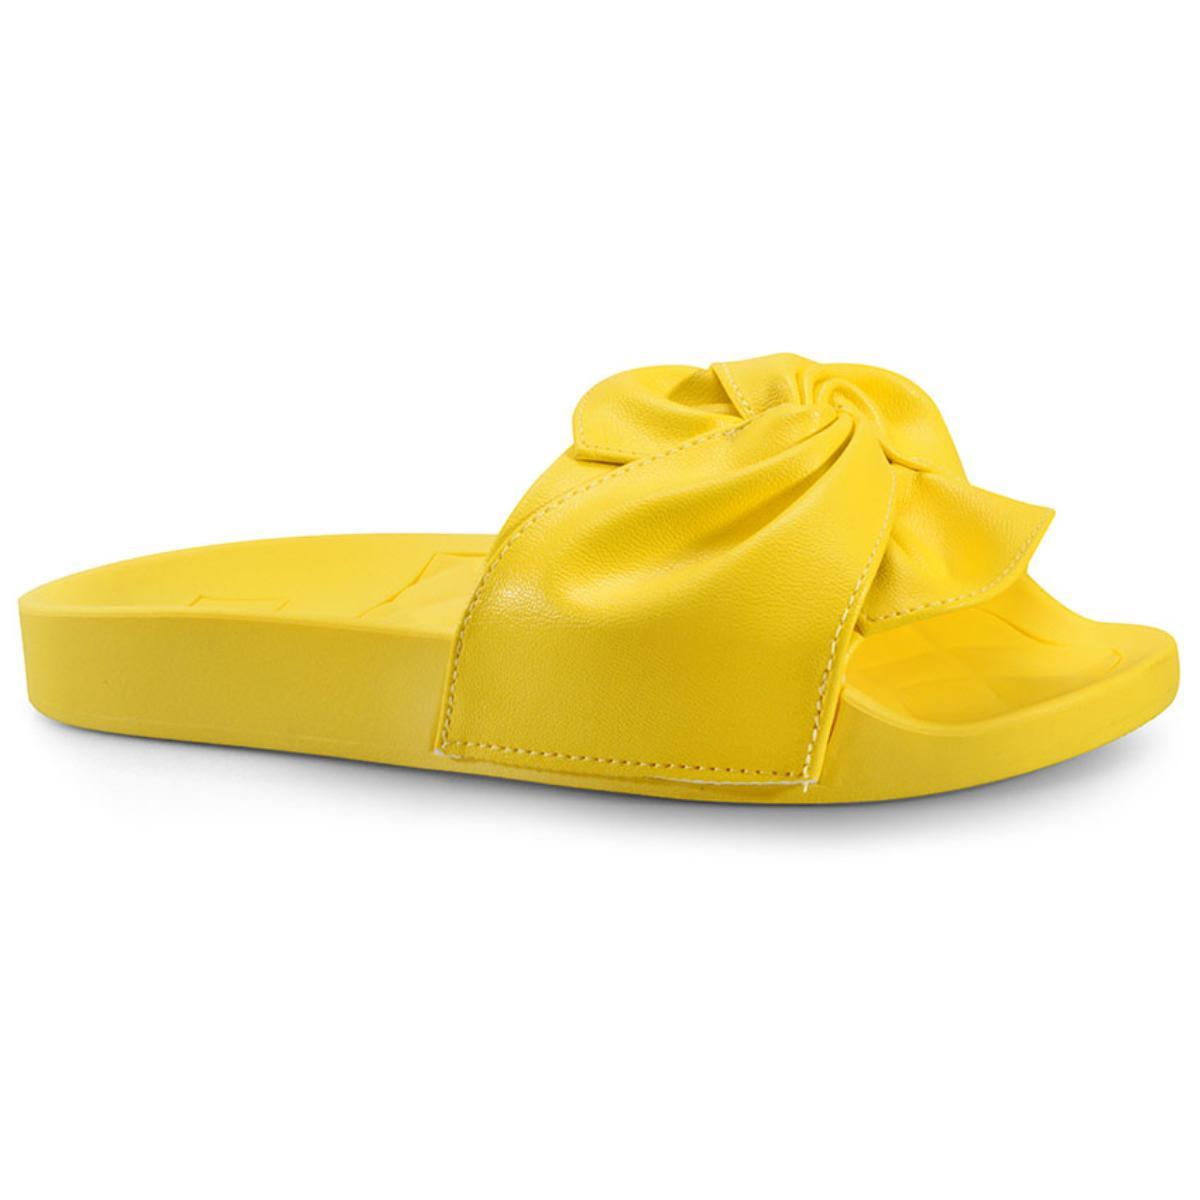 Tamanco Feminino Moleca 5414144 Amarelo